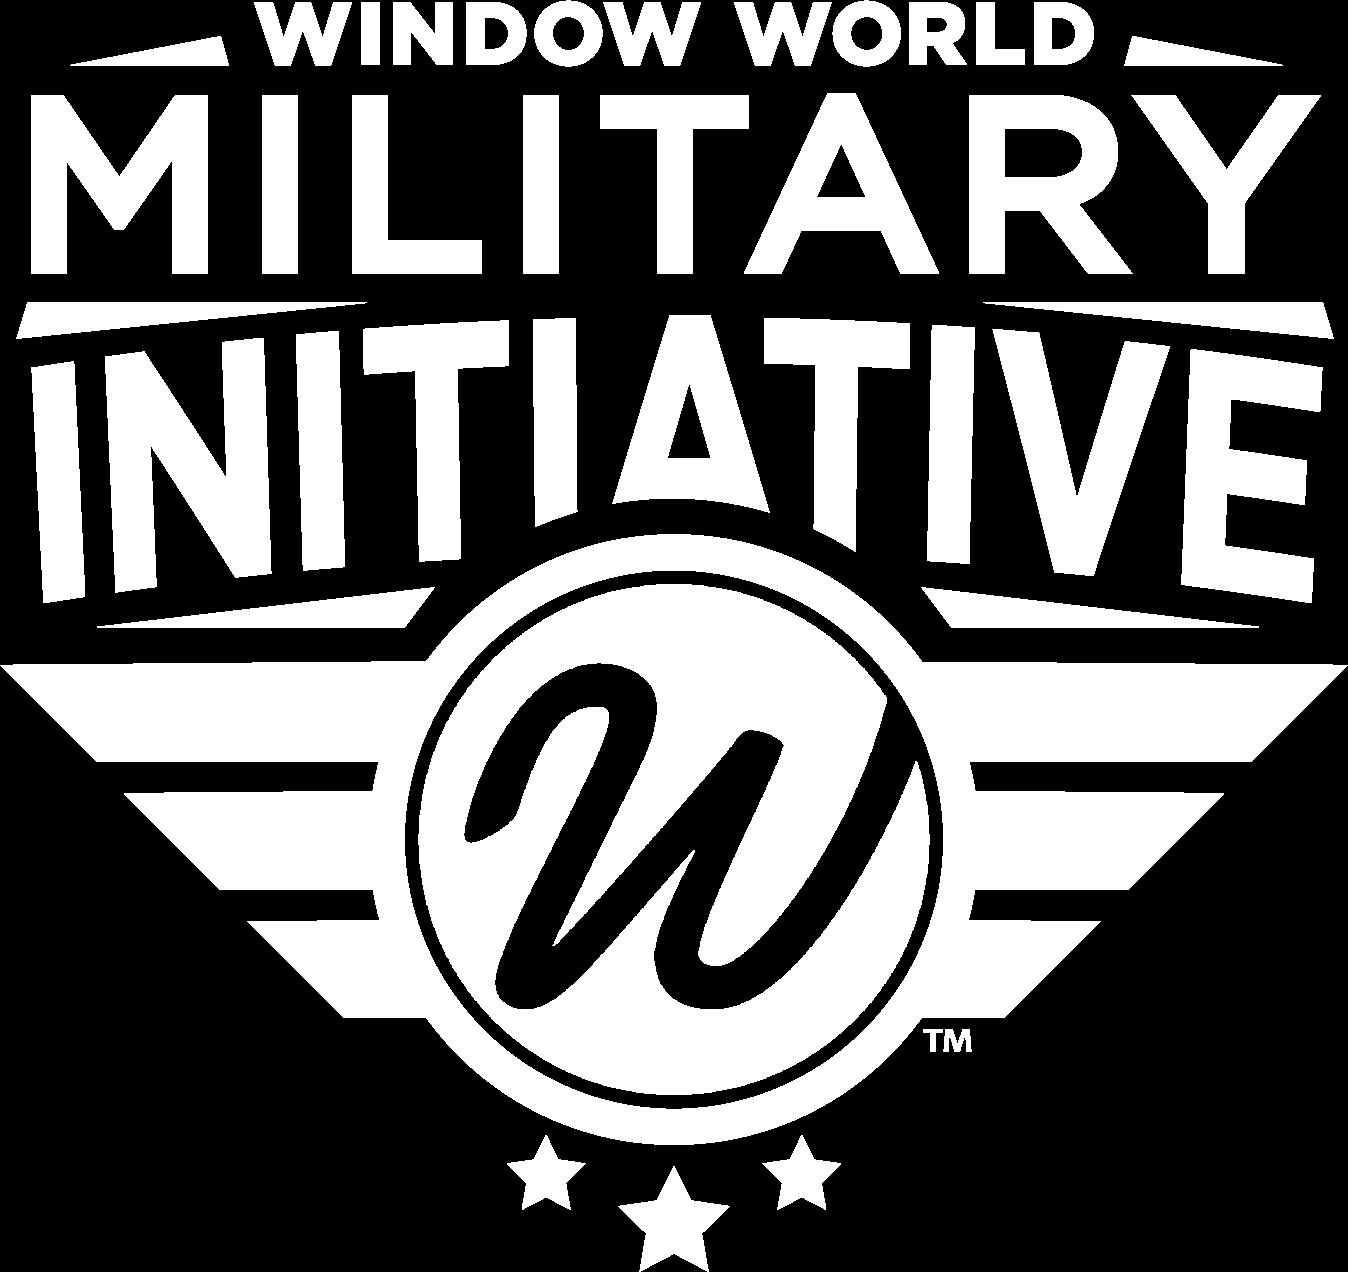 Window World Military Initiative